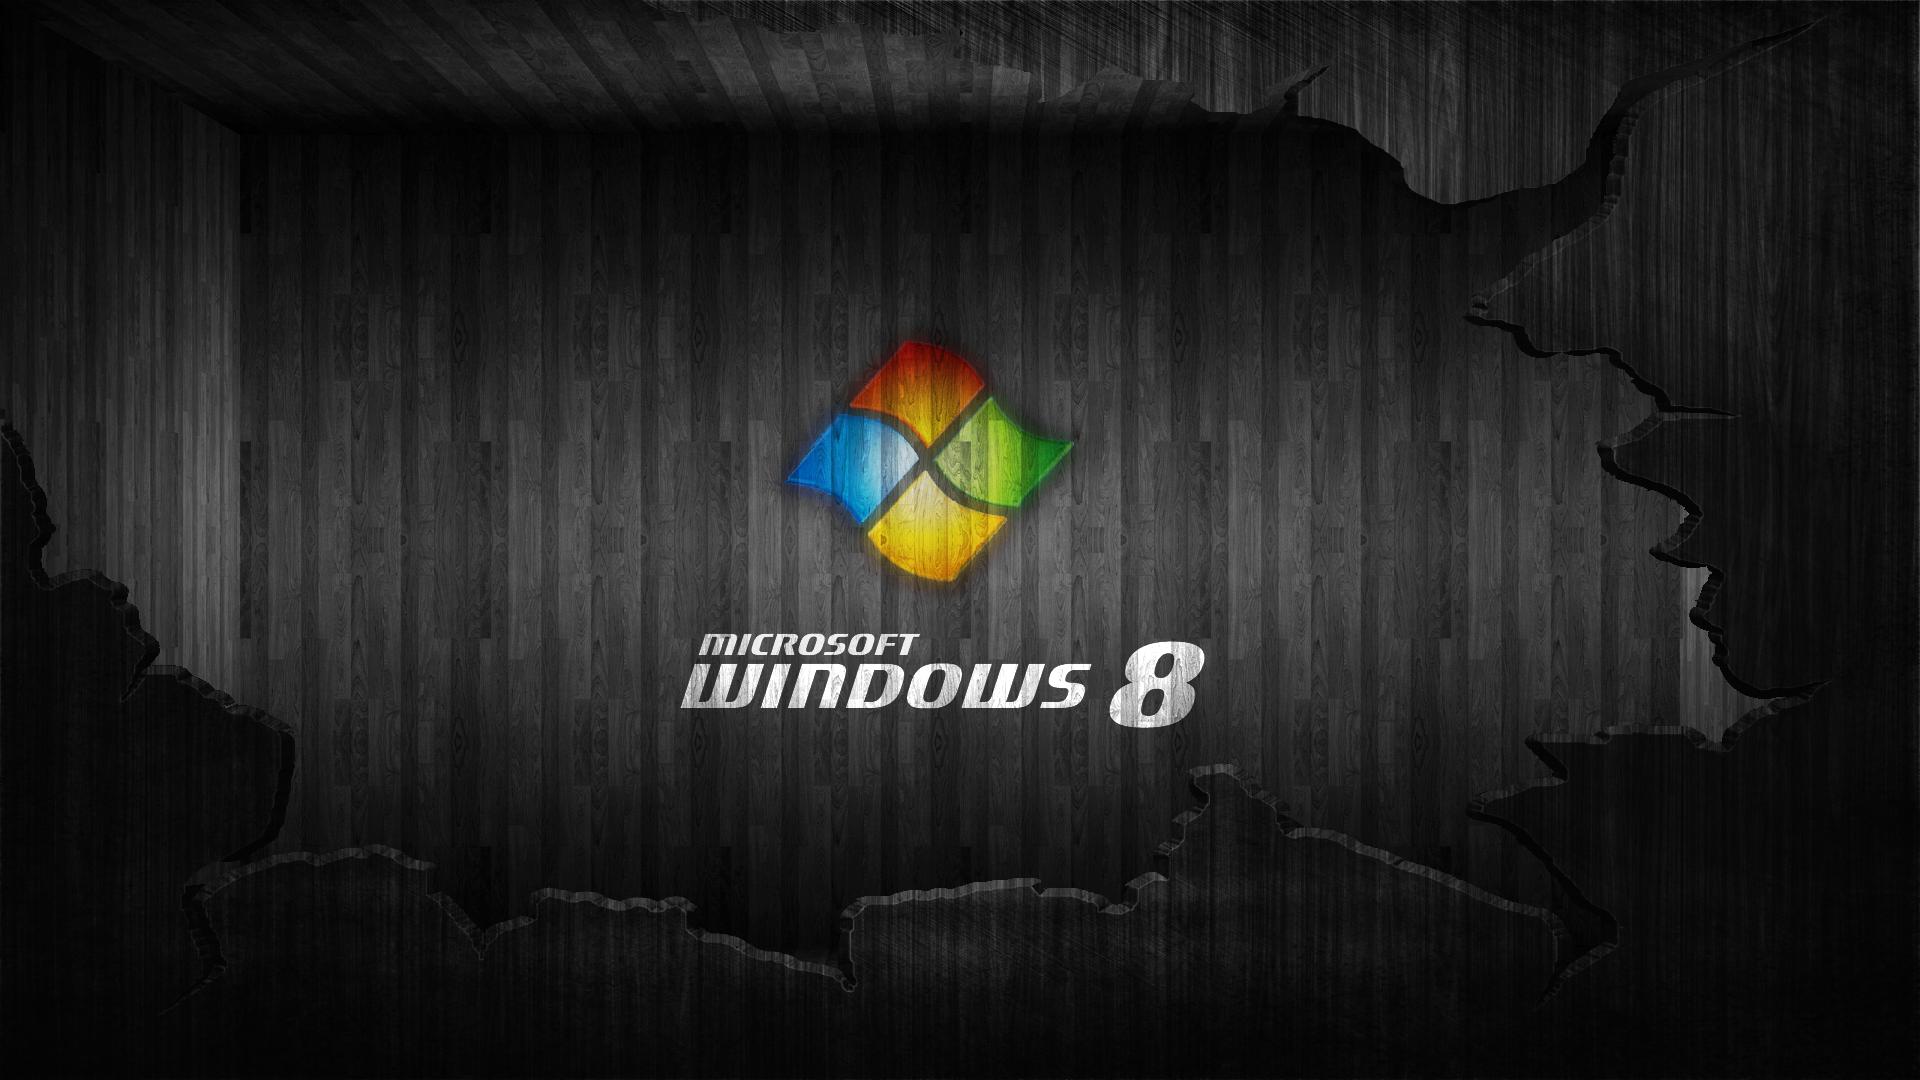 Windows 10 Desktop Is Black 21 Hd Wallpaper Hdblackwallpapercom